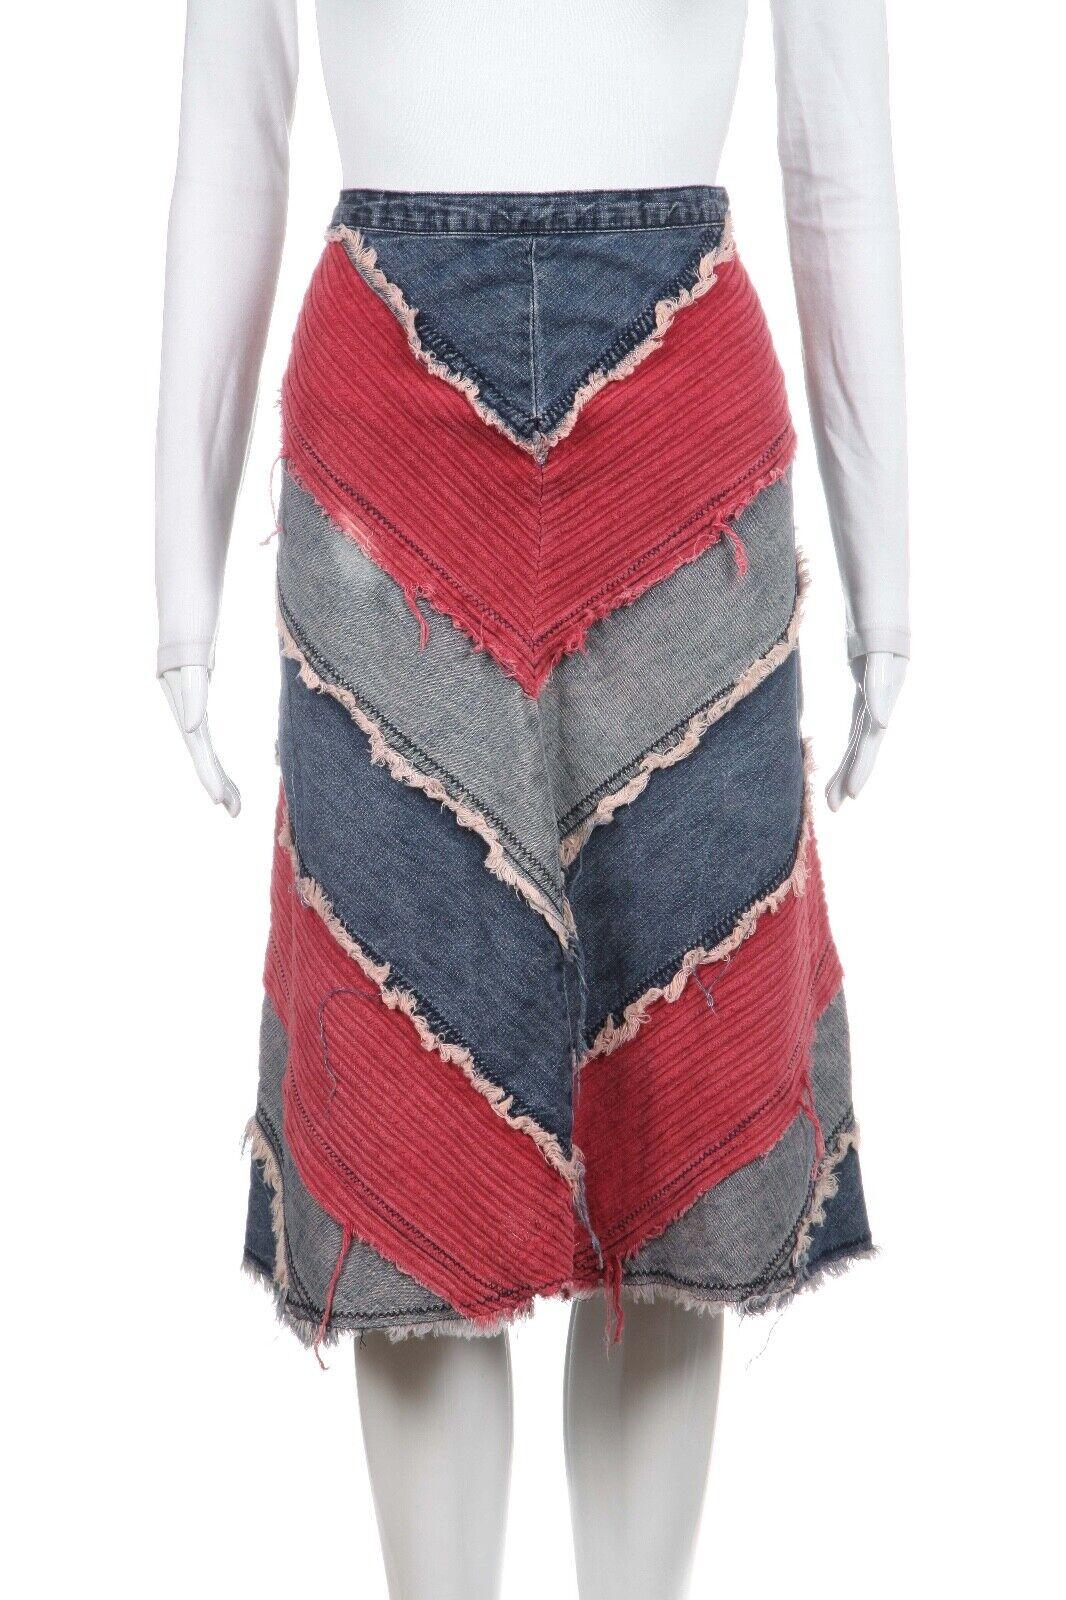 BUFFALO DAVID BITTON Denim Patch Skirt Size 30 100% Cotton bluee Red Knee Length